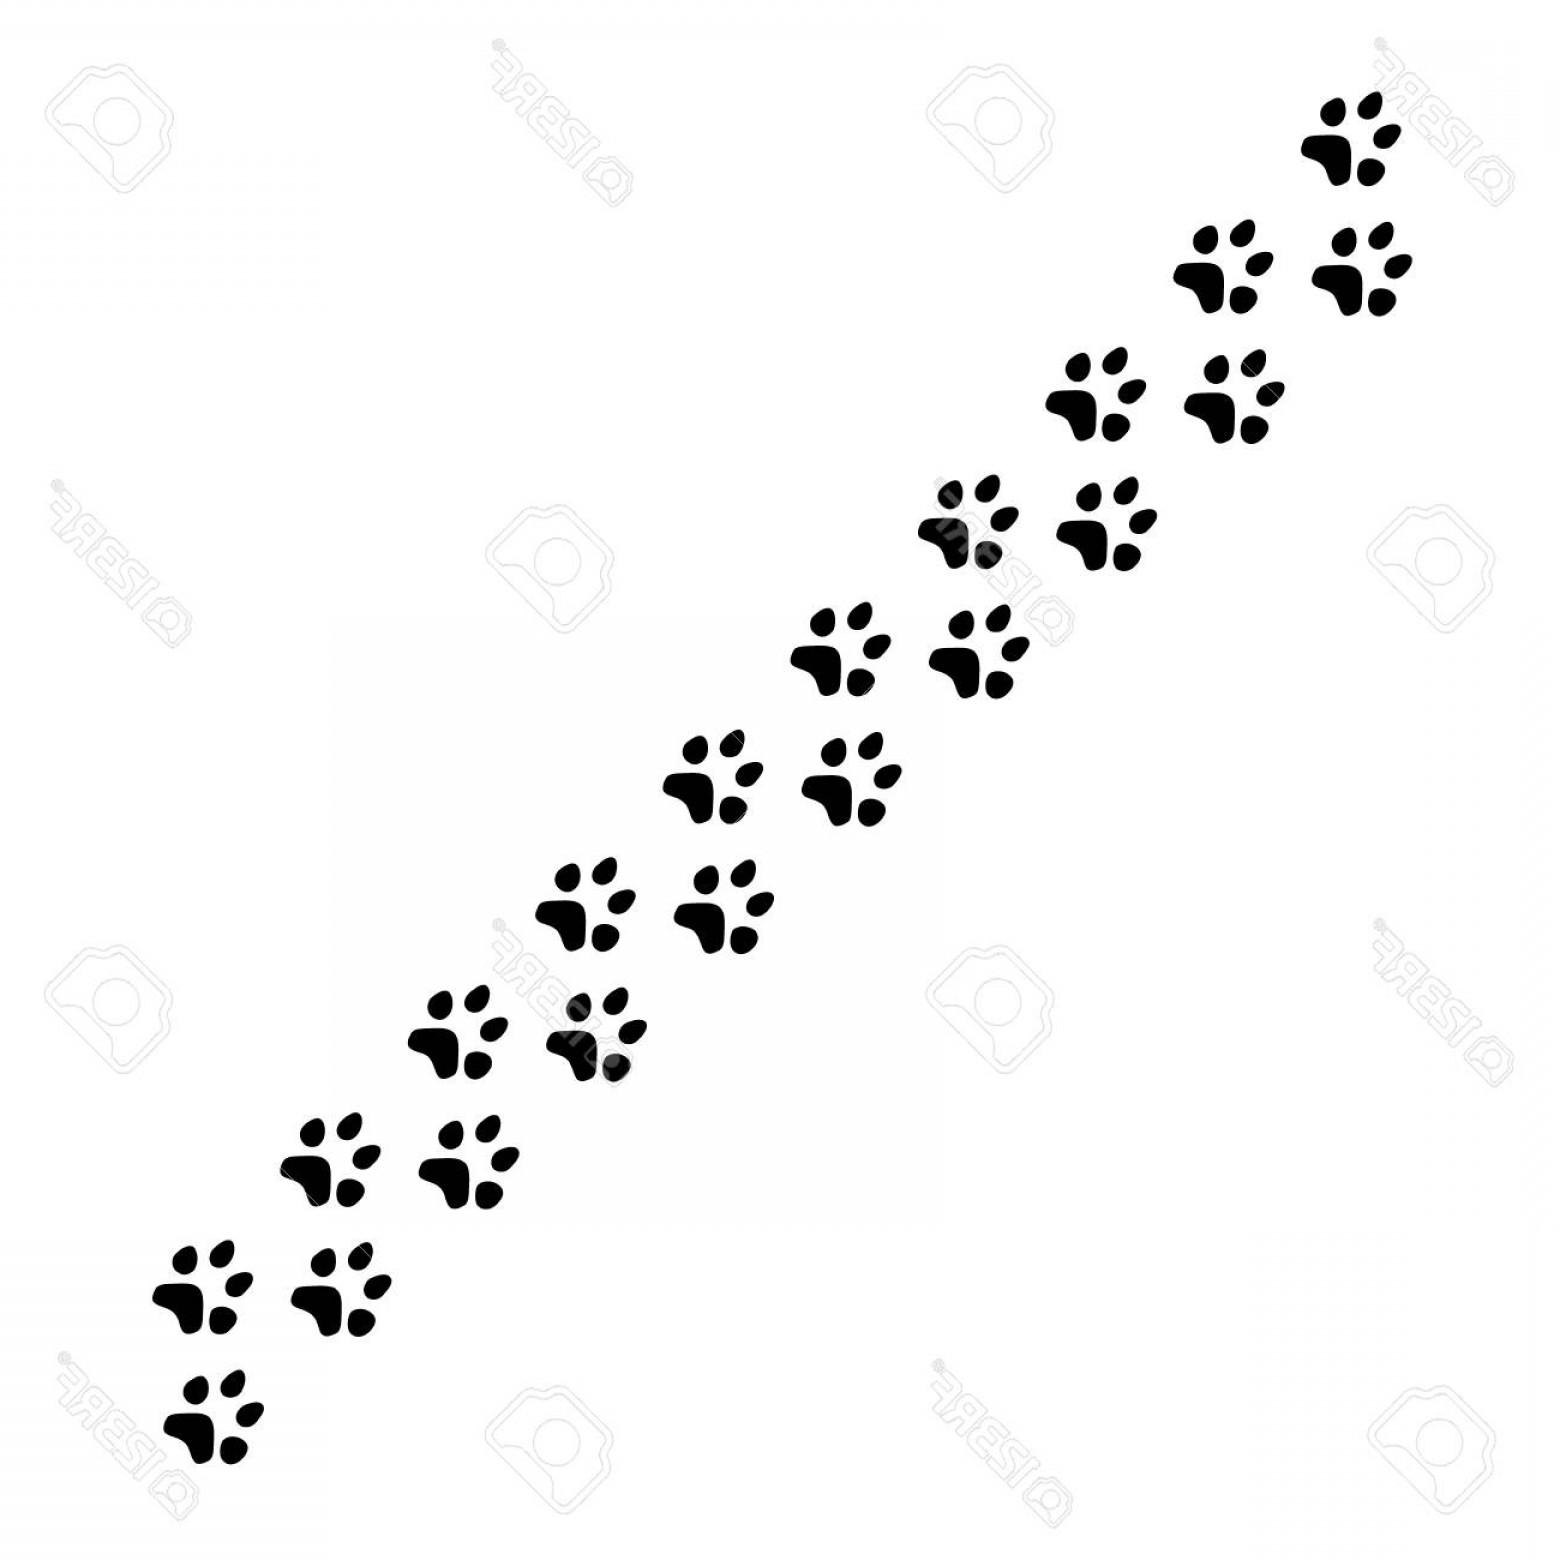 1560x1560 Photostock Vector Vector Illustration Black Silhouette Dog